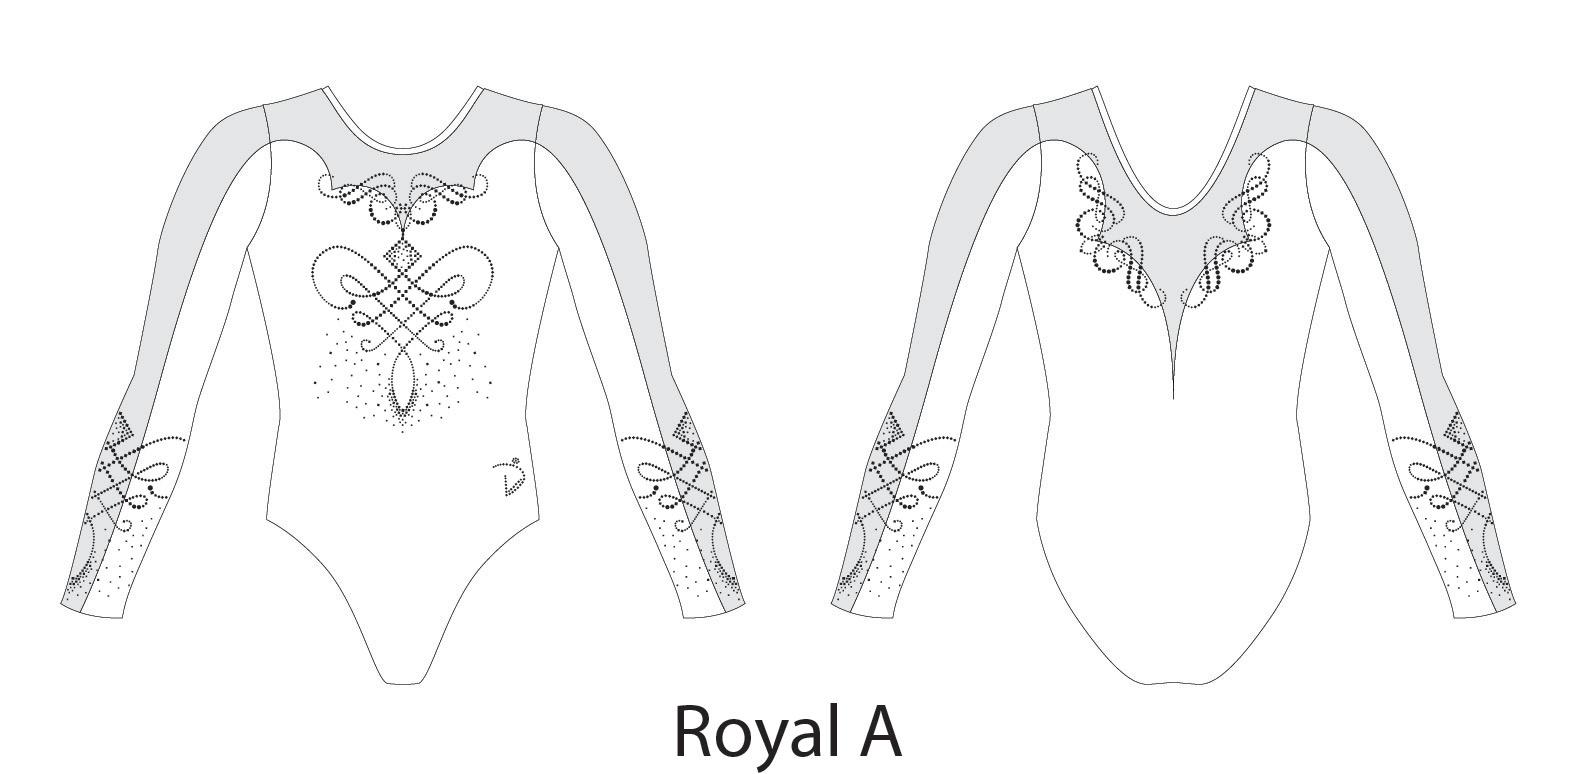 Royal A